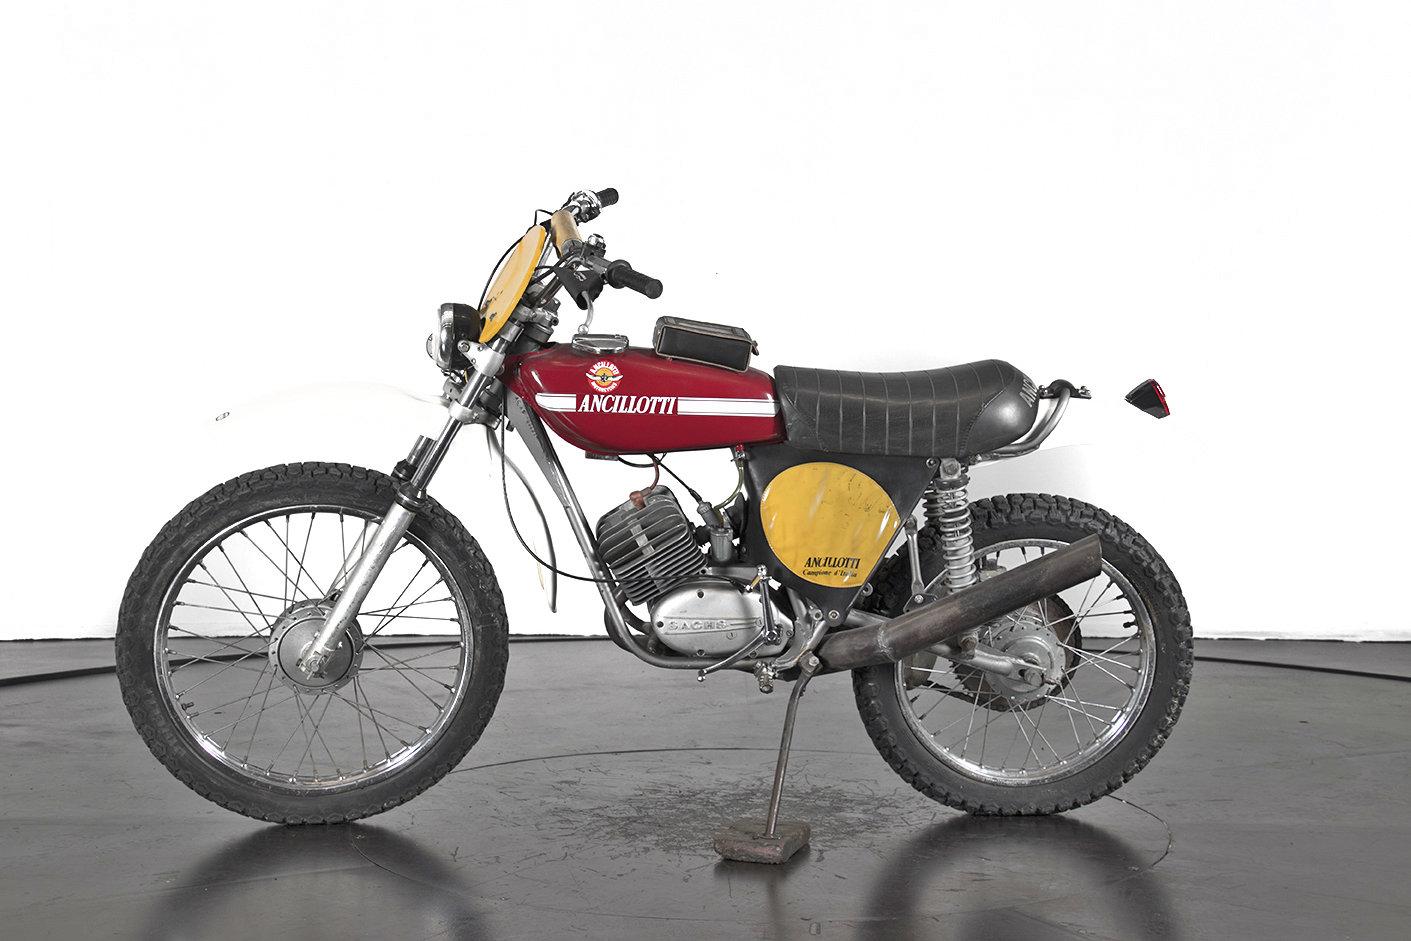 ANCILLOTTI - CROSS - 1977 For Sale (picture 1 of 6)